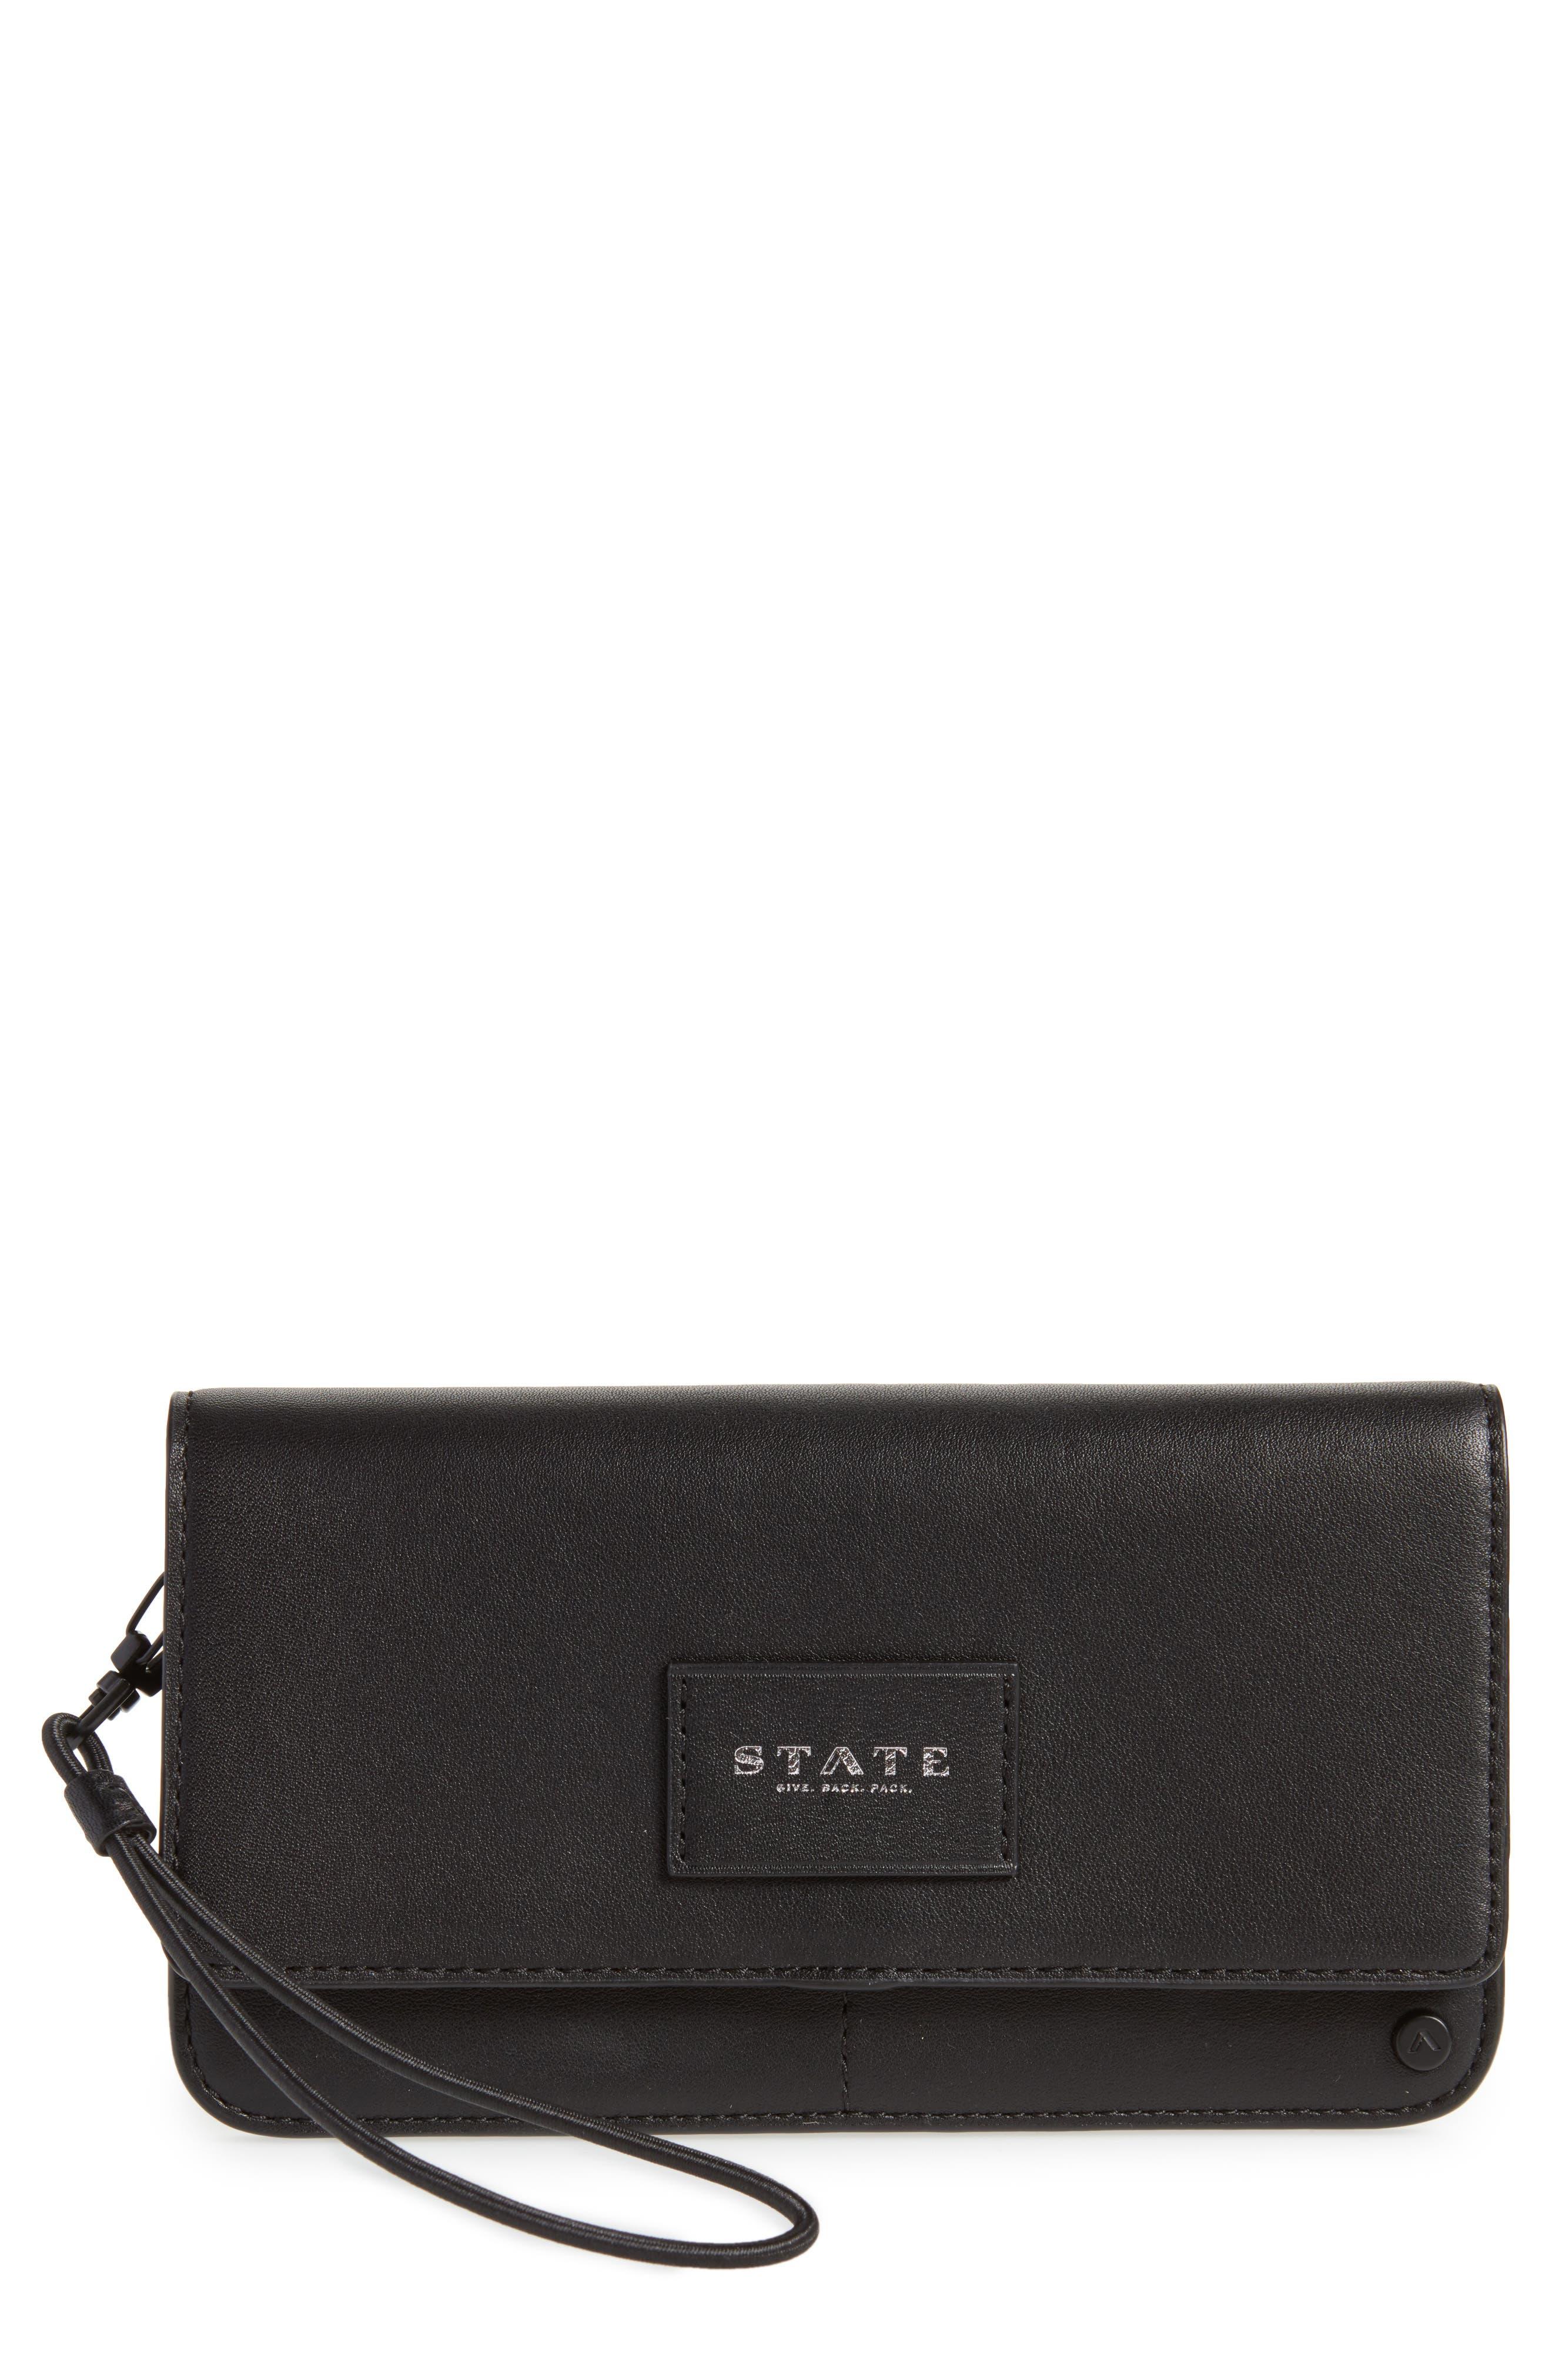 Main Image - STATE Bags Parkville Bristol Leather Wristlet